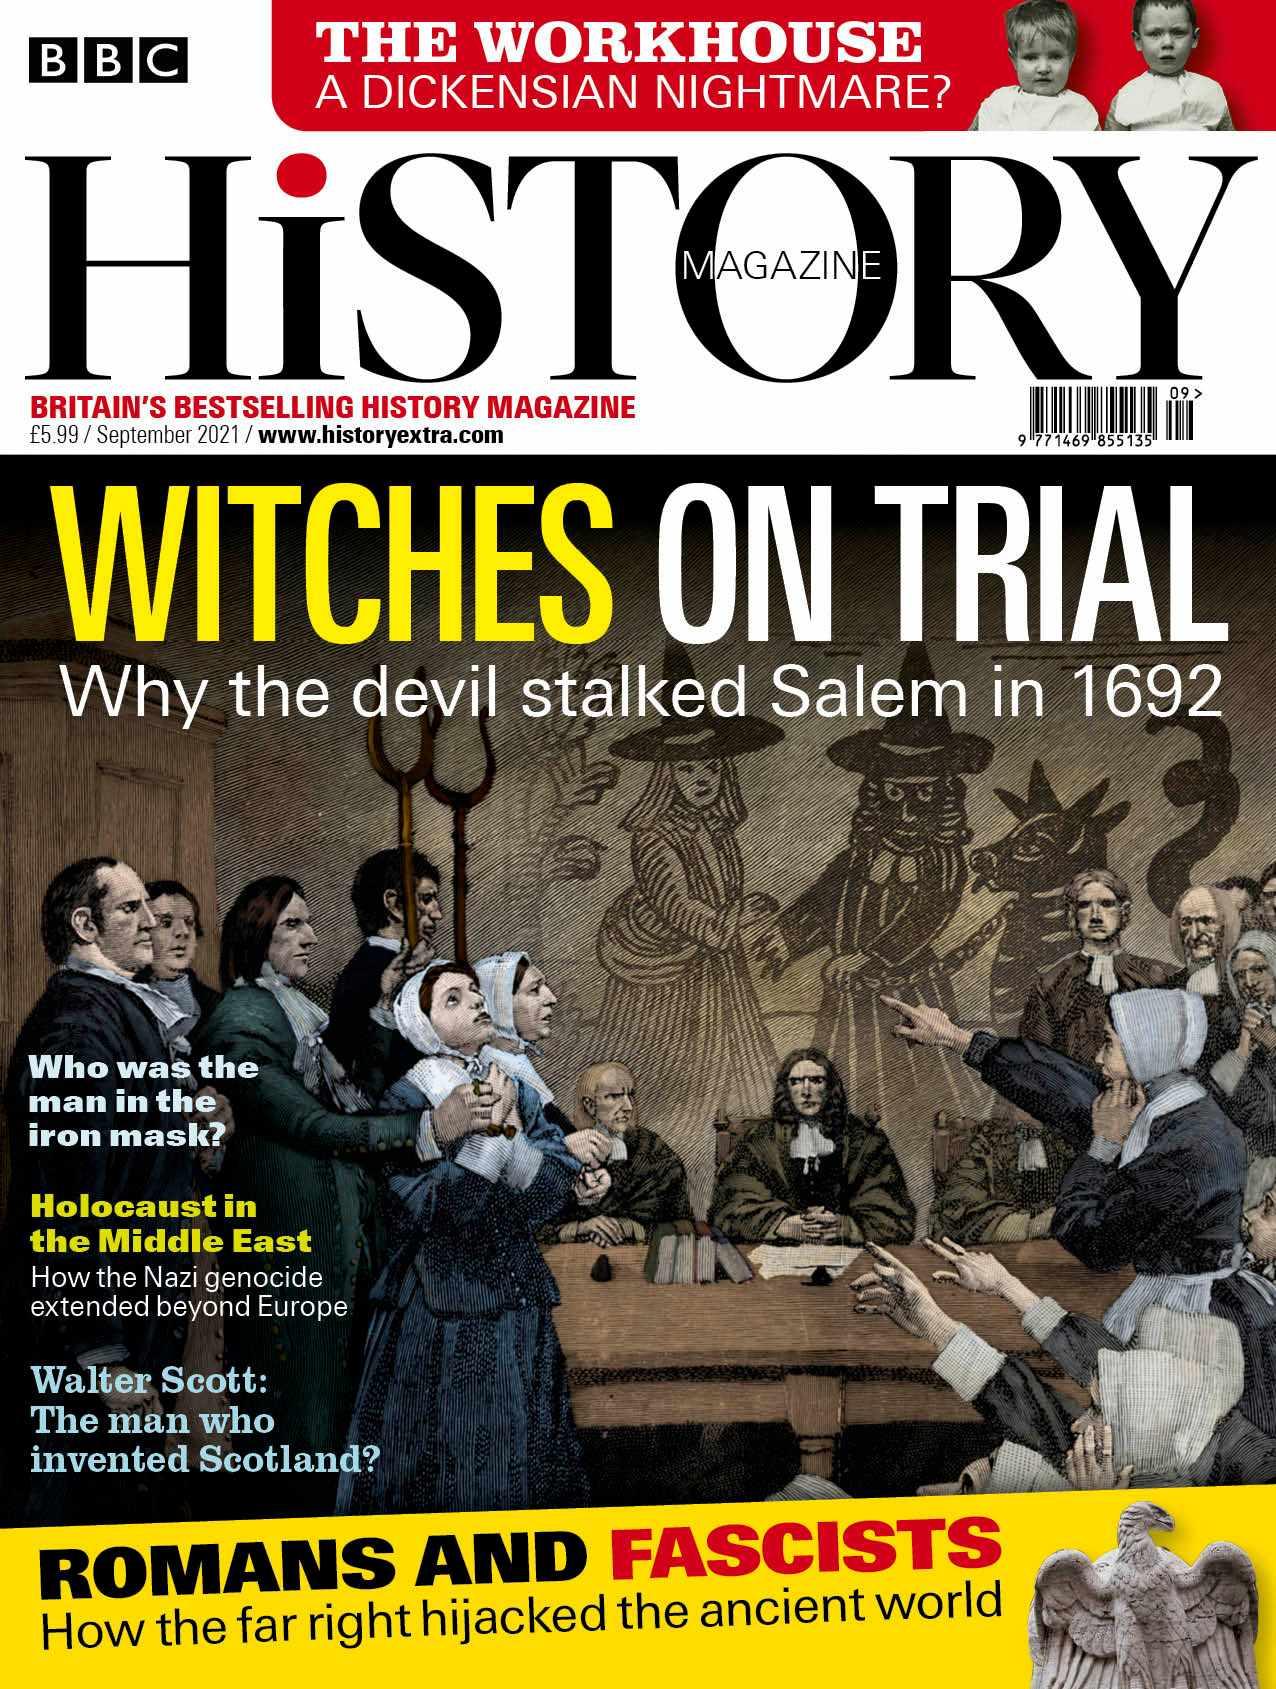 BBC History Magazine September 2021